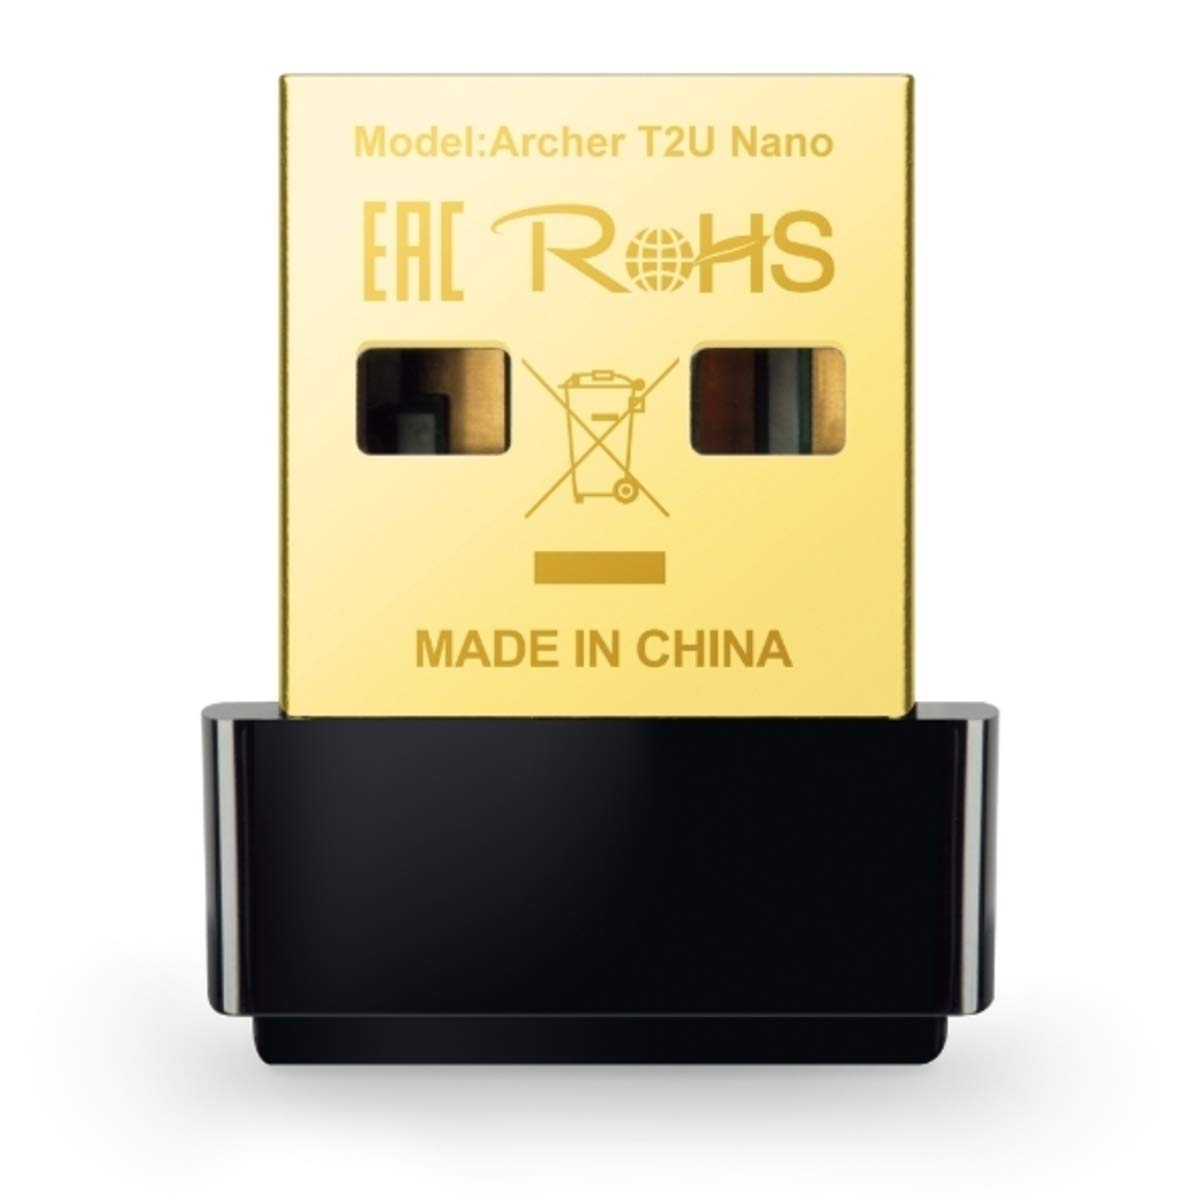 TP-Link Mini - AC600 USB 2.0 Wifi Adapter | 2.4G/5G Dual Band Wireless Network Adapter for PC Desktop | Mini Travel Size |  Supports Windows 10, 8.1, 8, 7, XP / Mac OS X 10.9-10.13 (Archer T2U Nano)